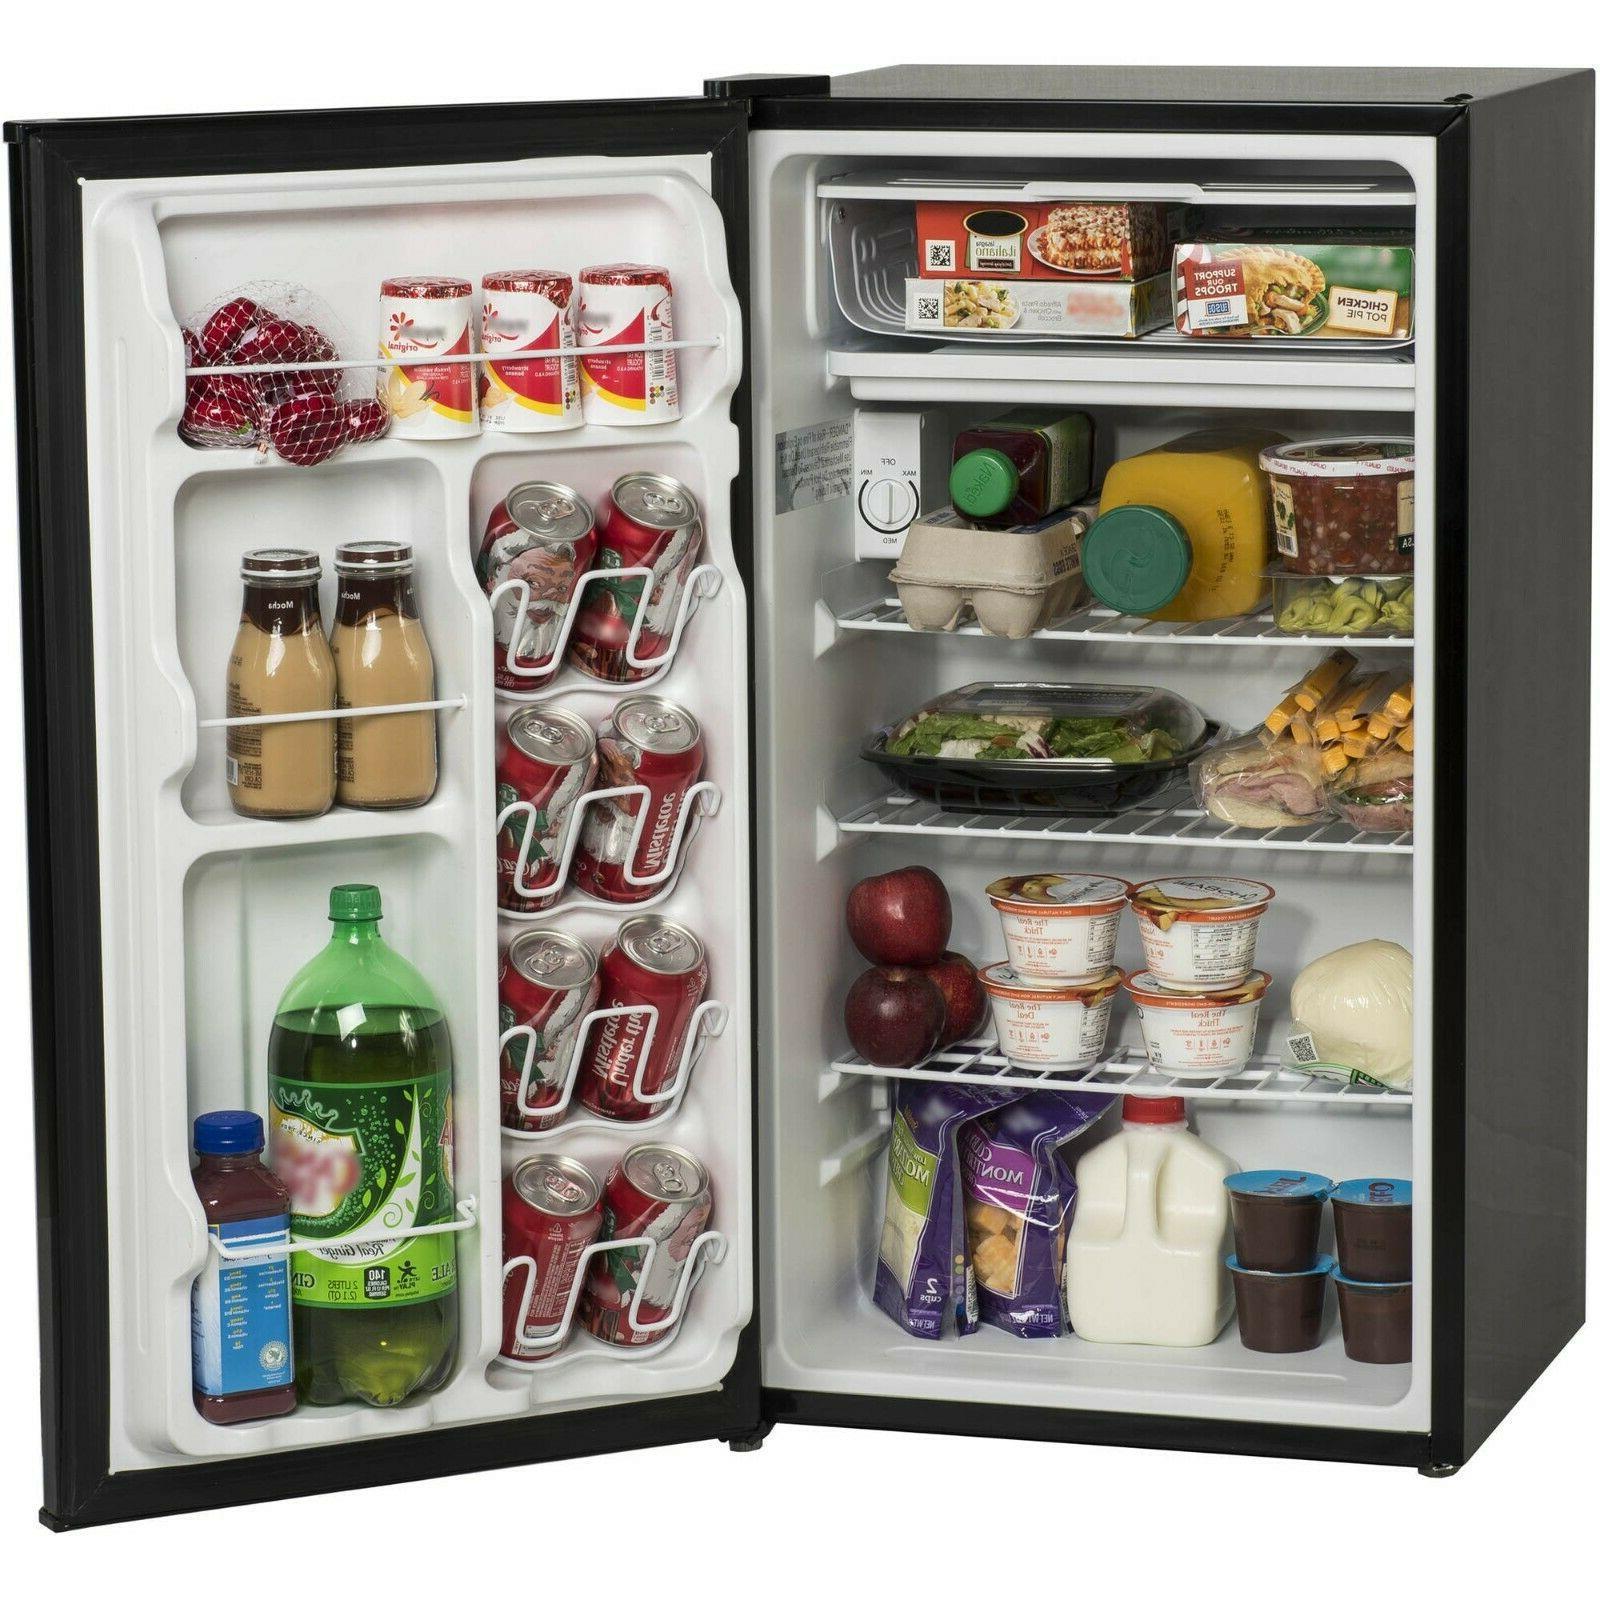 3.2 Cu Ft Mini Fridge Freezer 2-Door Compact Refrigerator Bl